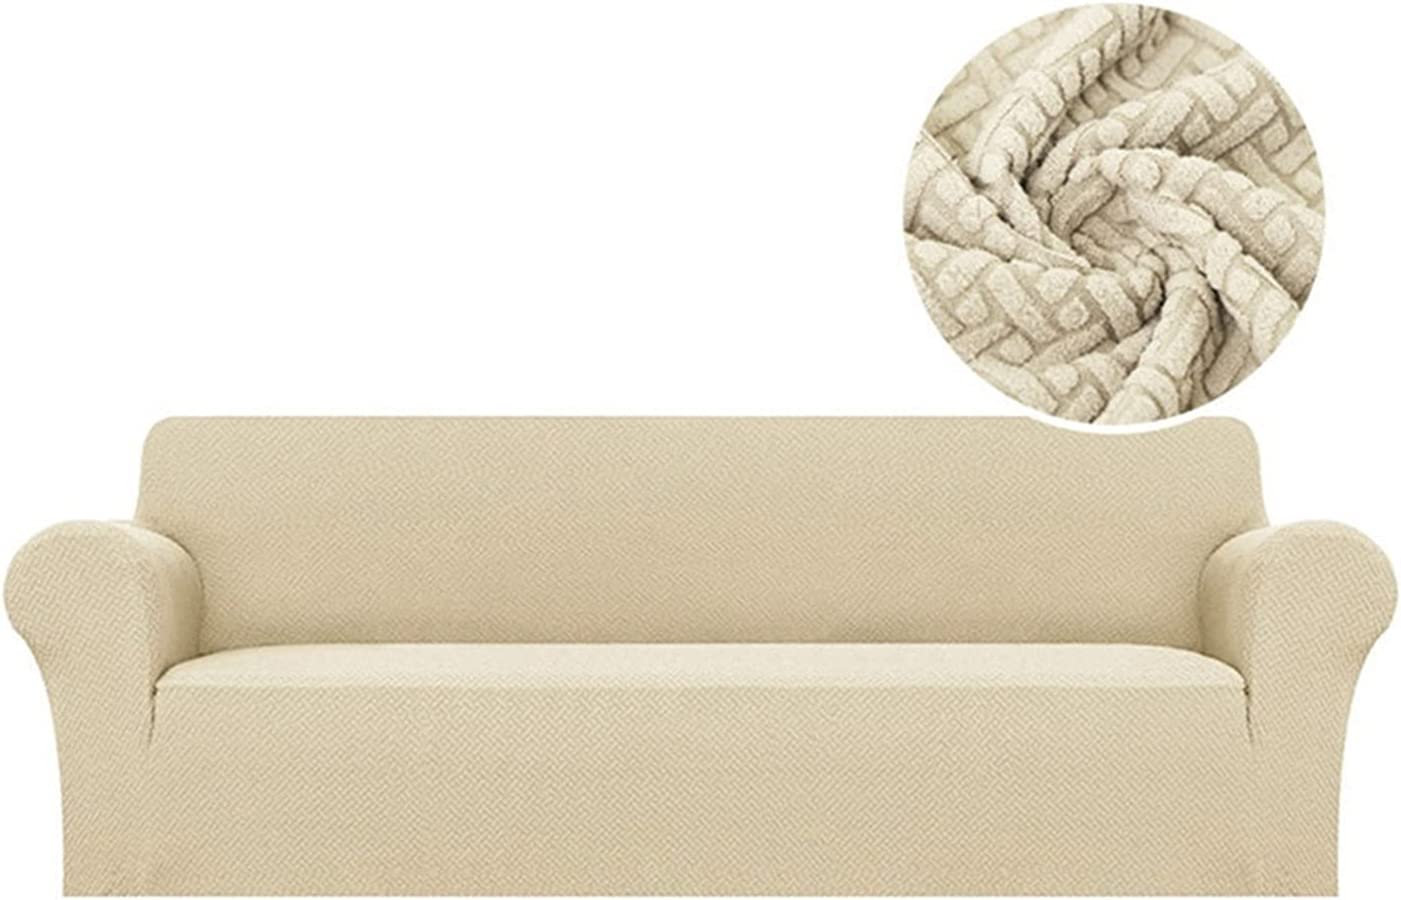 XUELINGTANG Jacquard Stretch Virginia Beach Mall Sofa Cover Elastic for Room Living Ranking TOP15